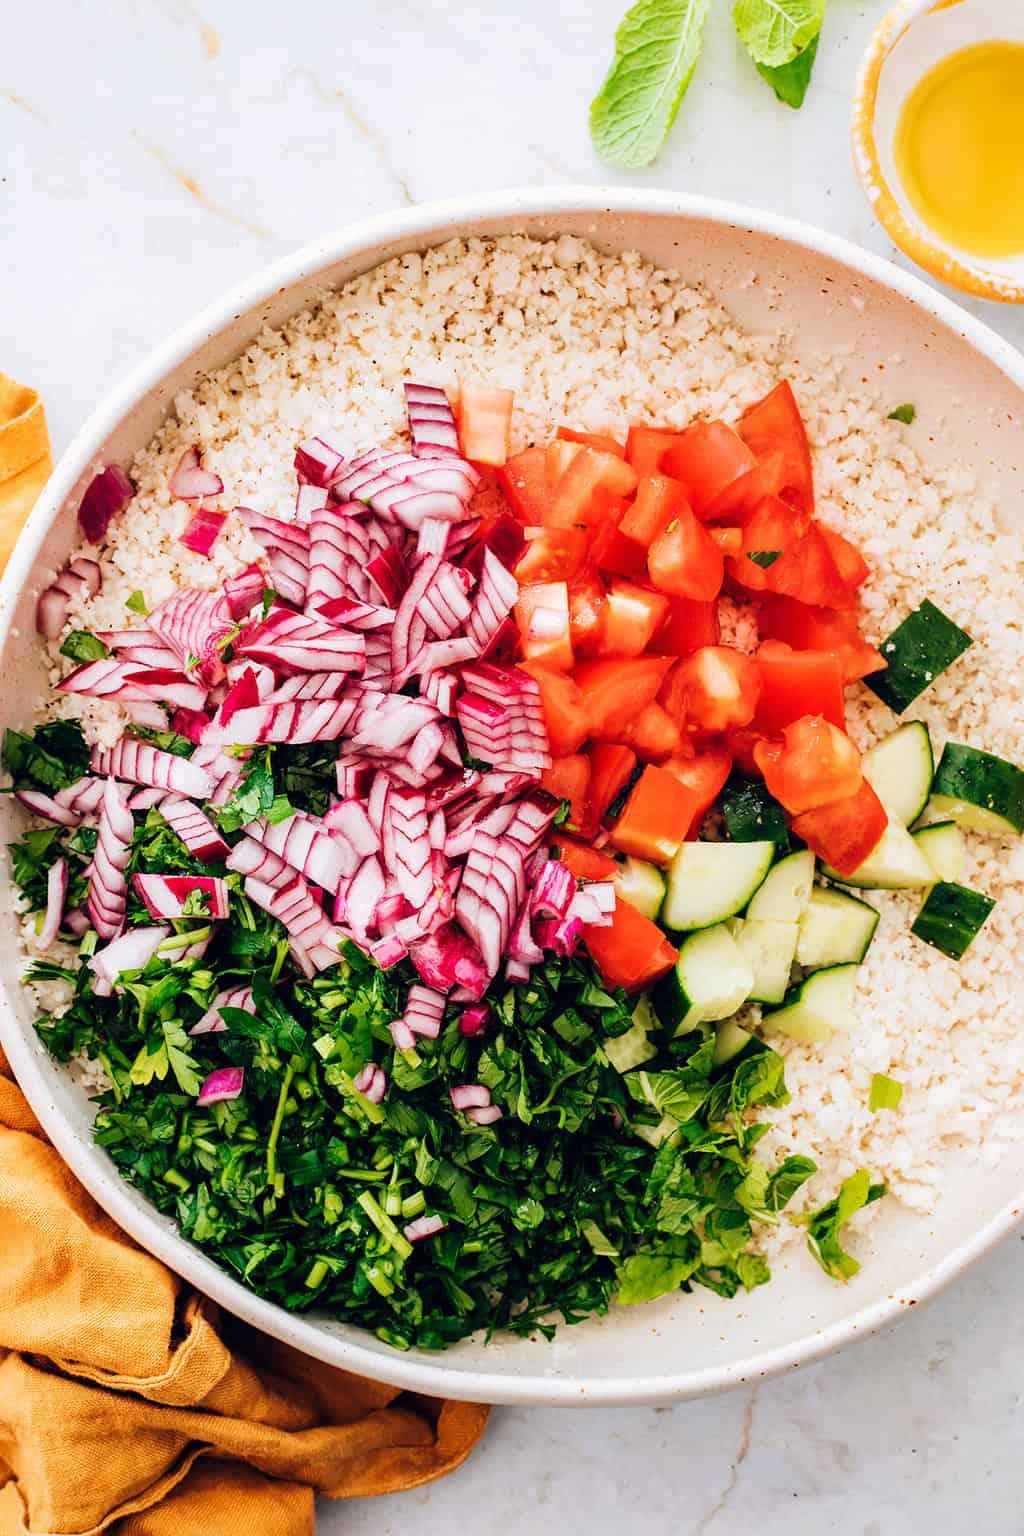 Cauliflower Rice Tabbouleh Salad Recipe